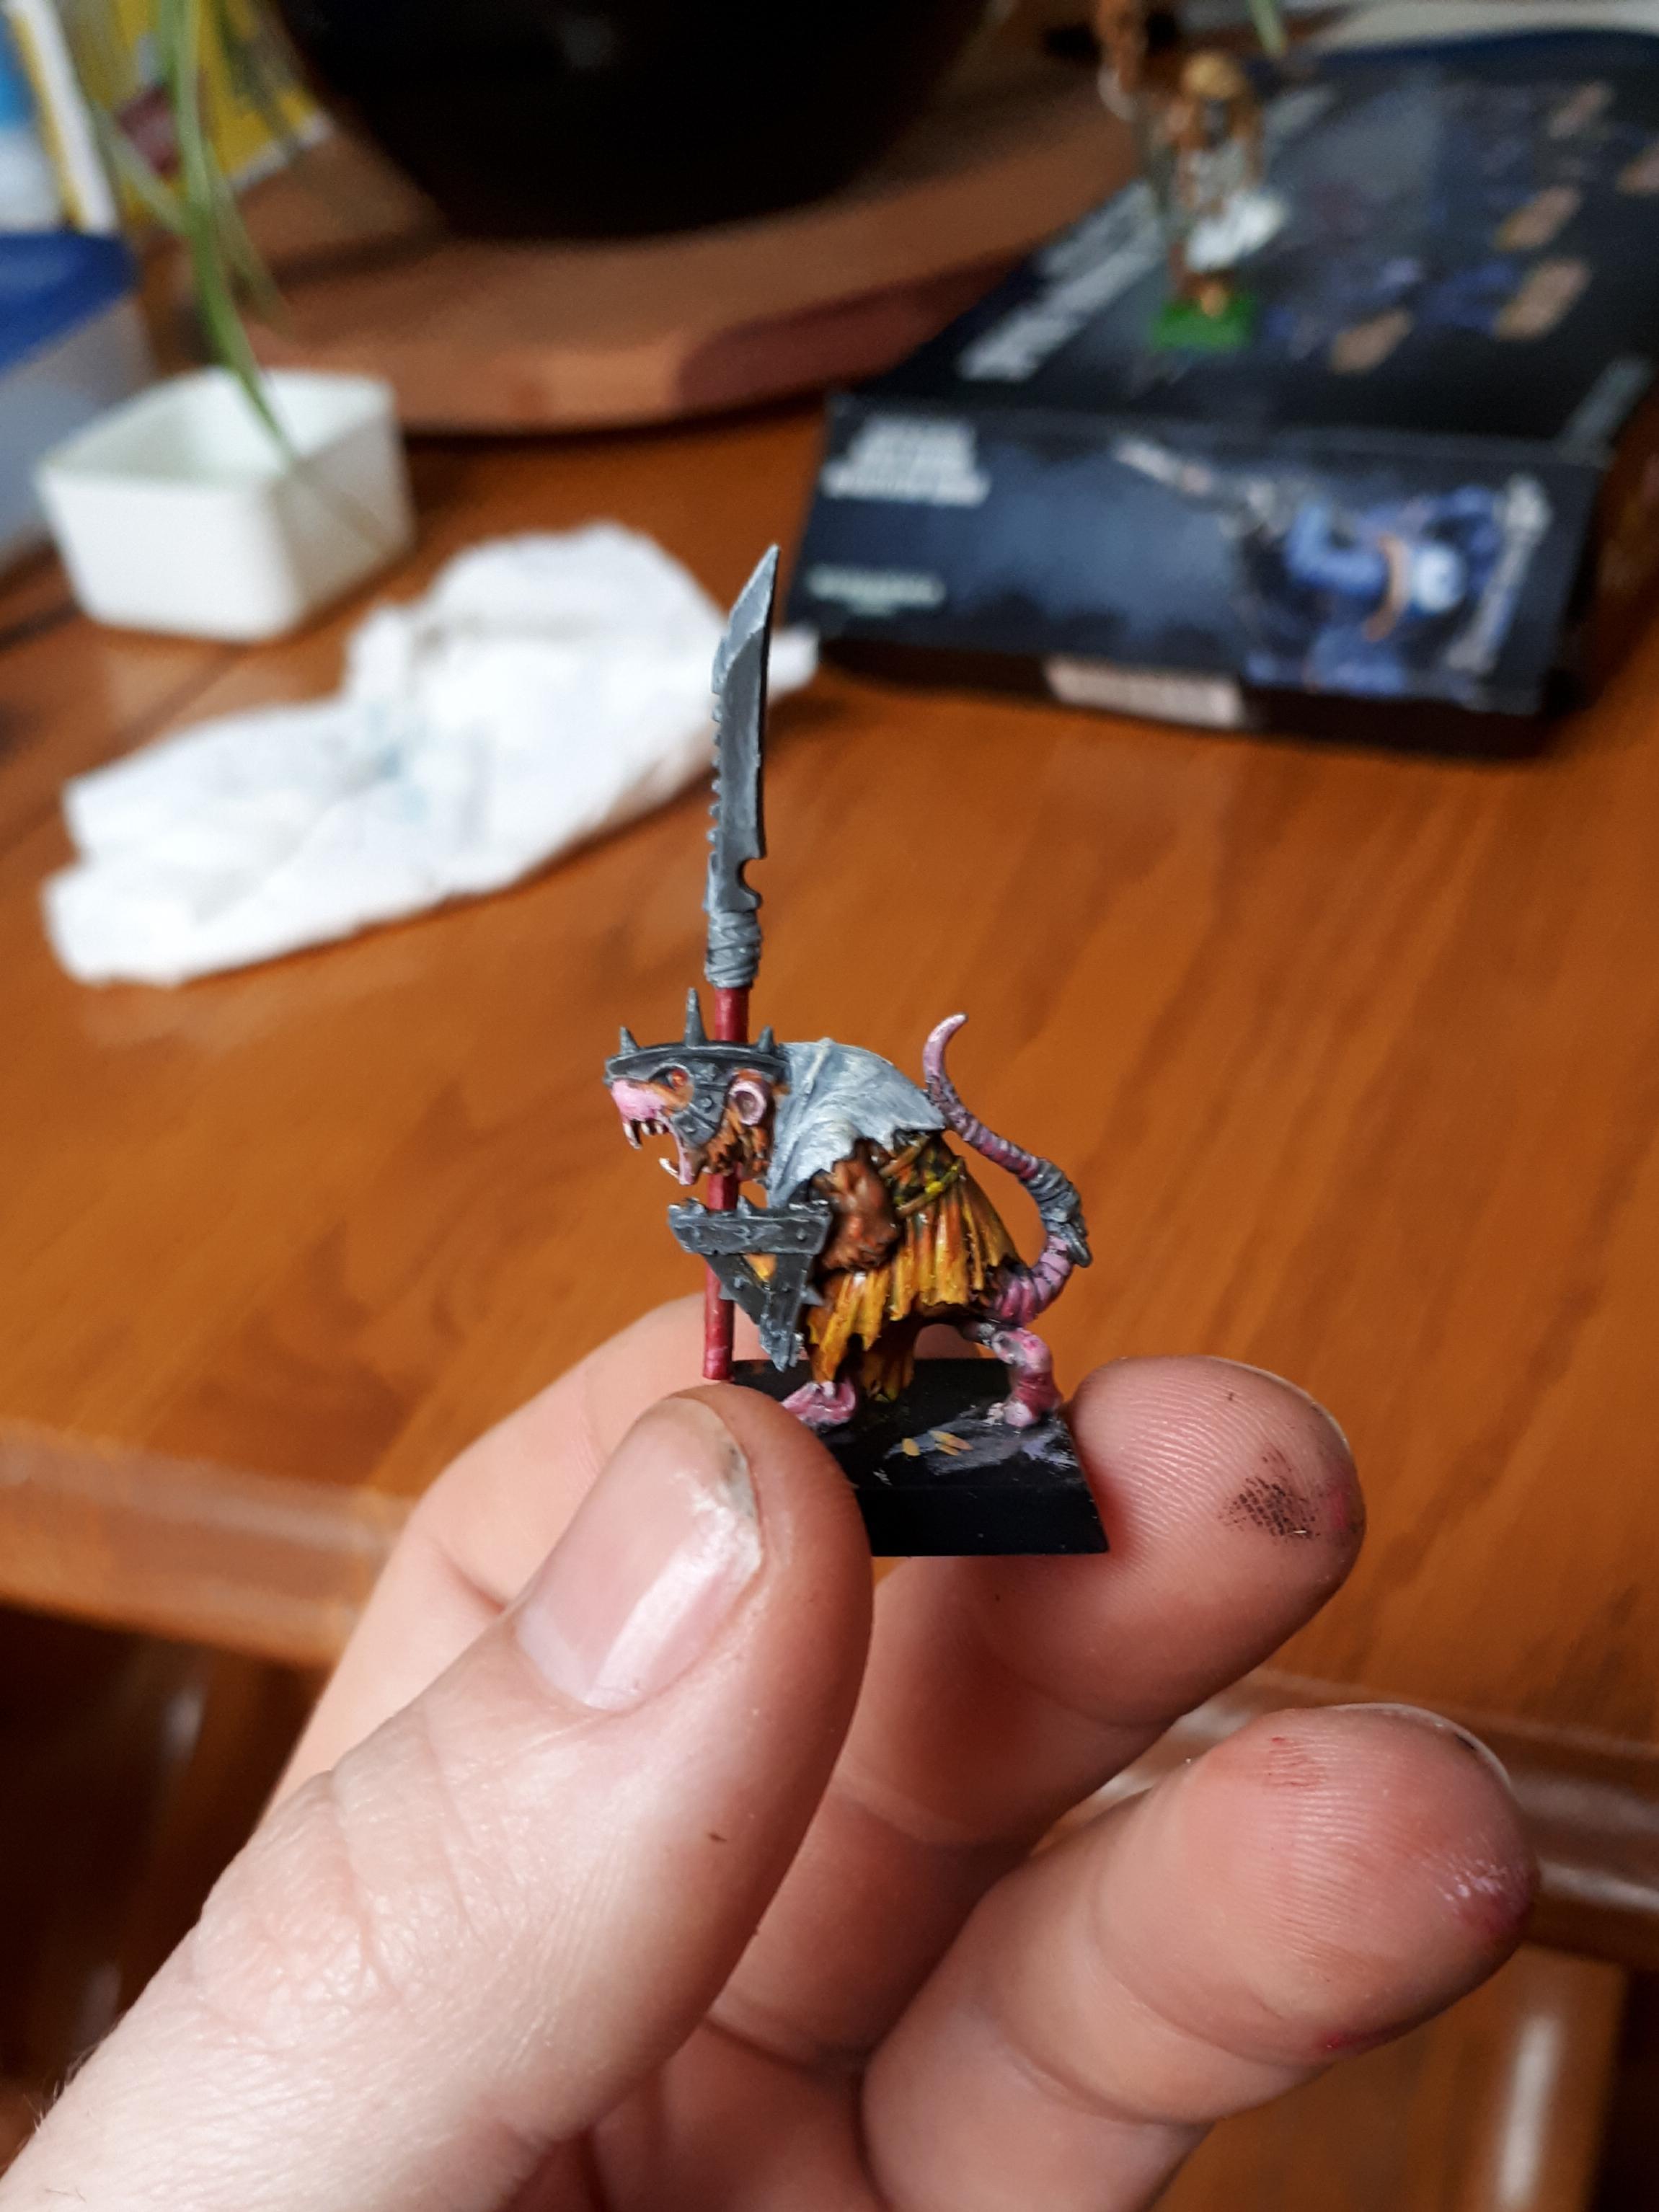 Age Of Sigmar, Skaven, Warhammer Fantasy